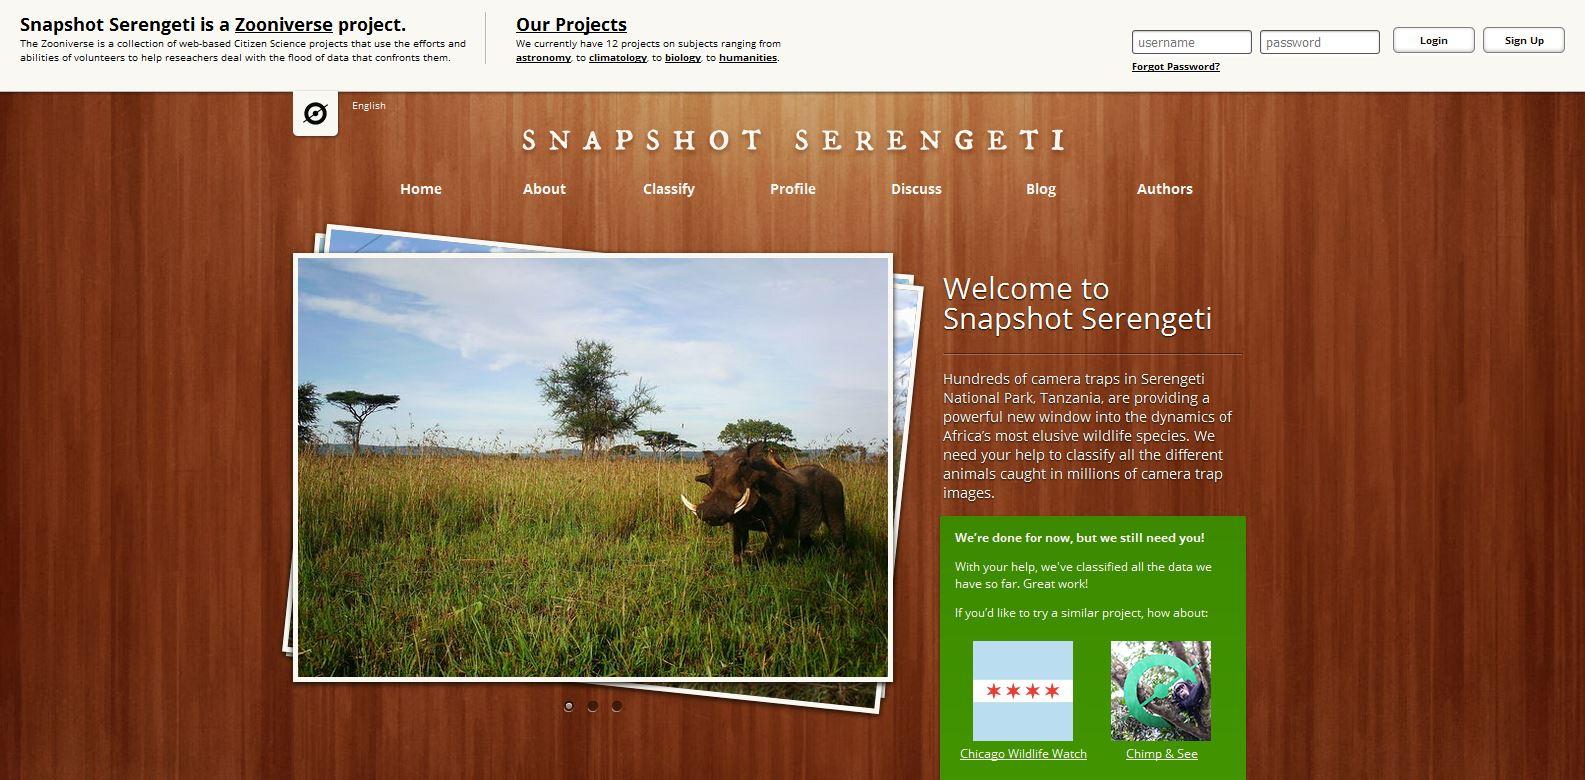 Snapshot Serengeti invites users to classify animals photographed in Serengeti National Park.